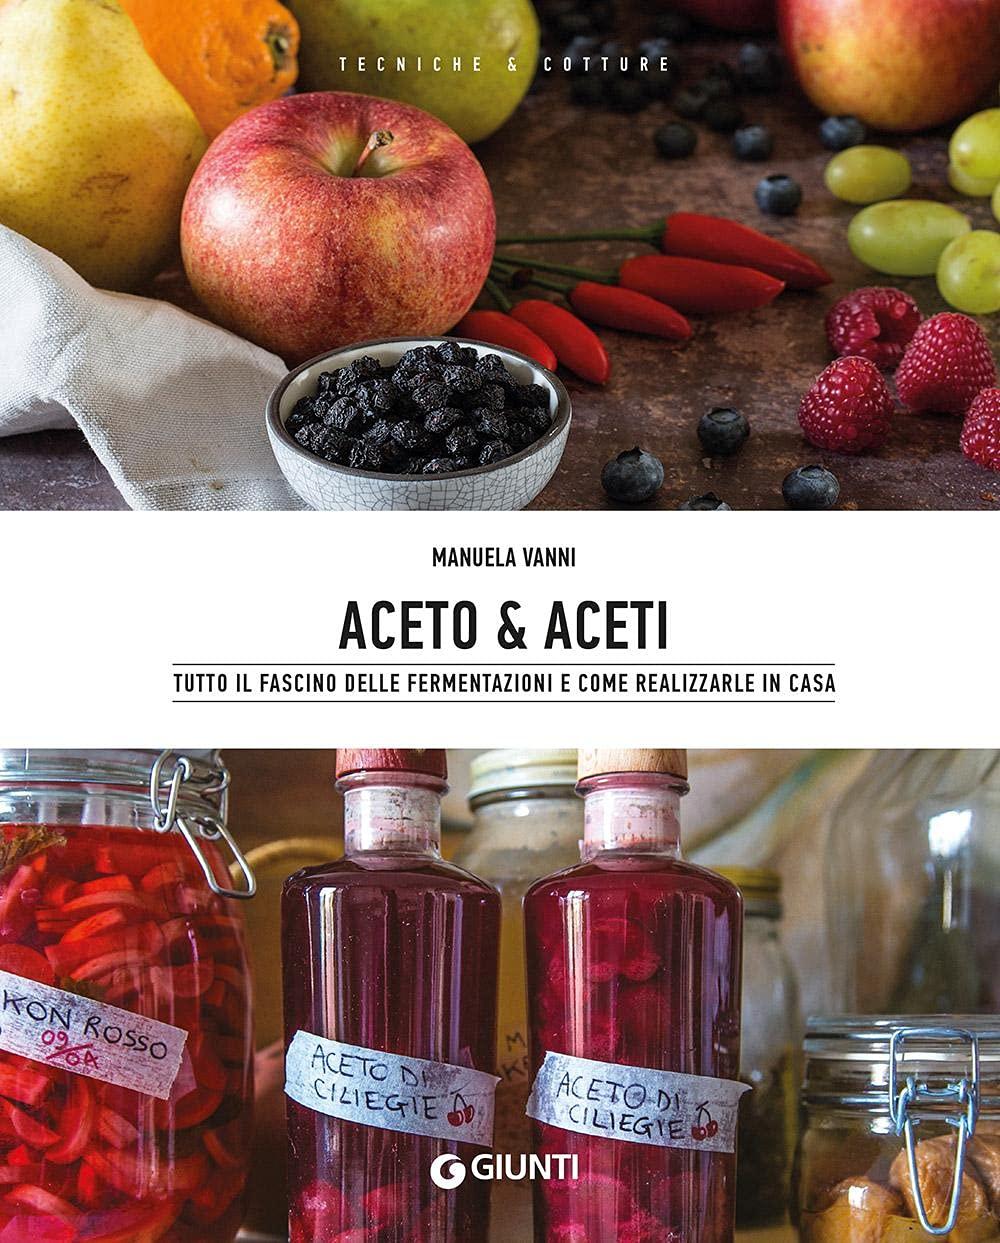 Recensione di Aceto & Aceti – Manuela Vanni